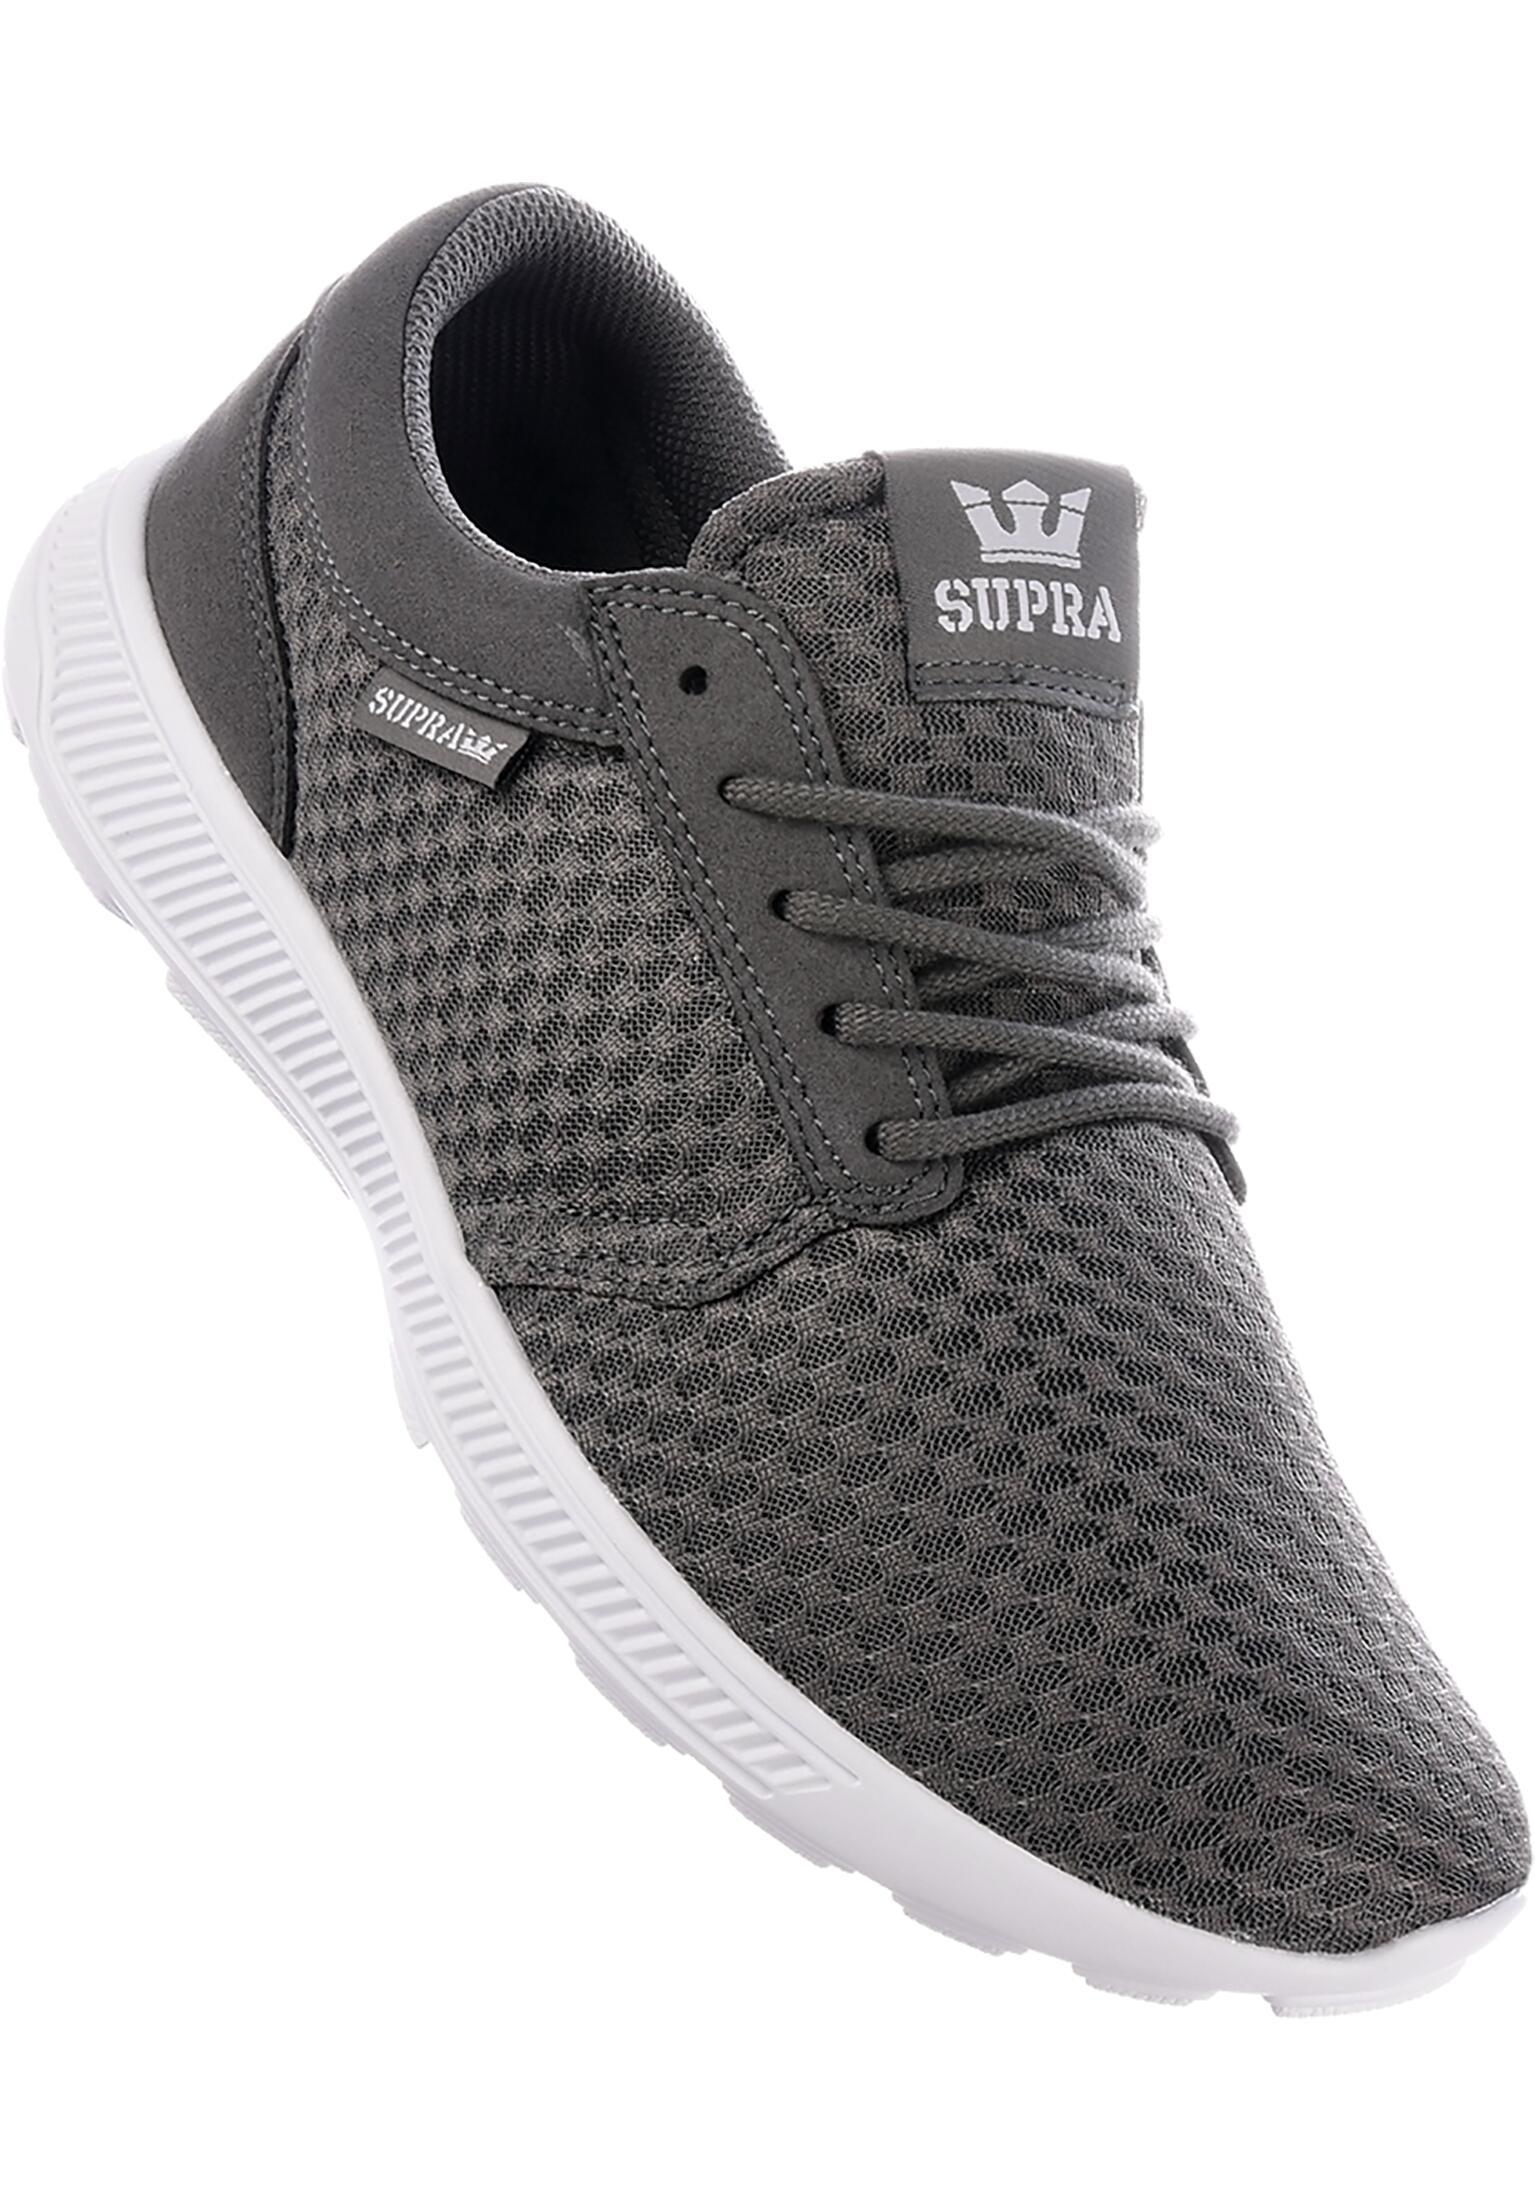 85aca020baa7 Hammer Run Supra All Shoes in grey-white for Men